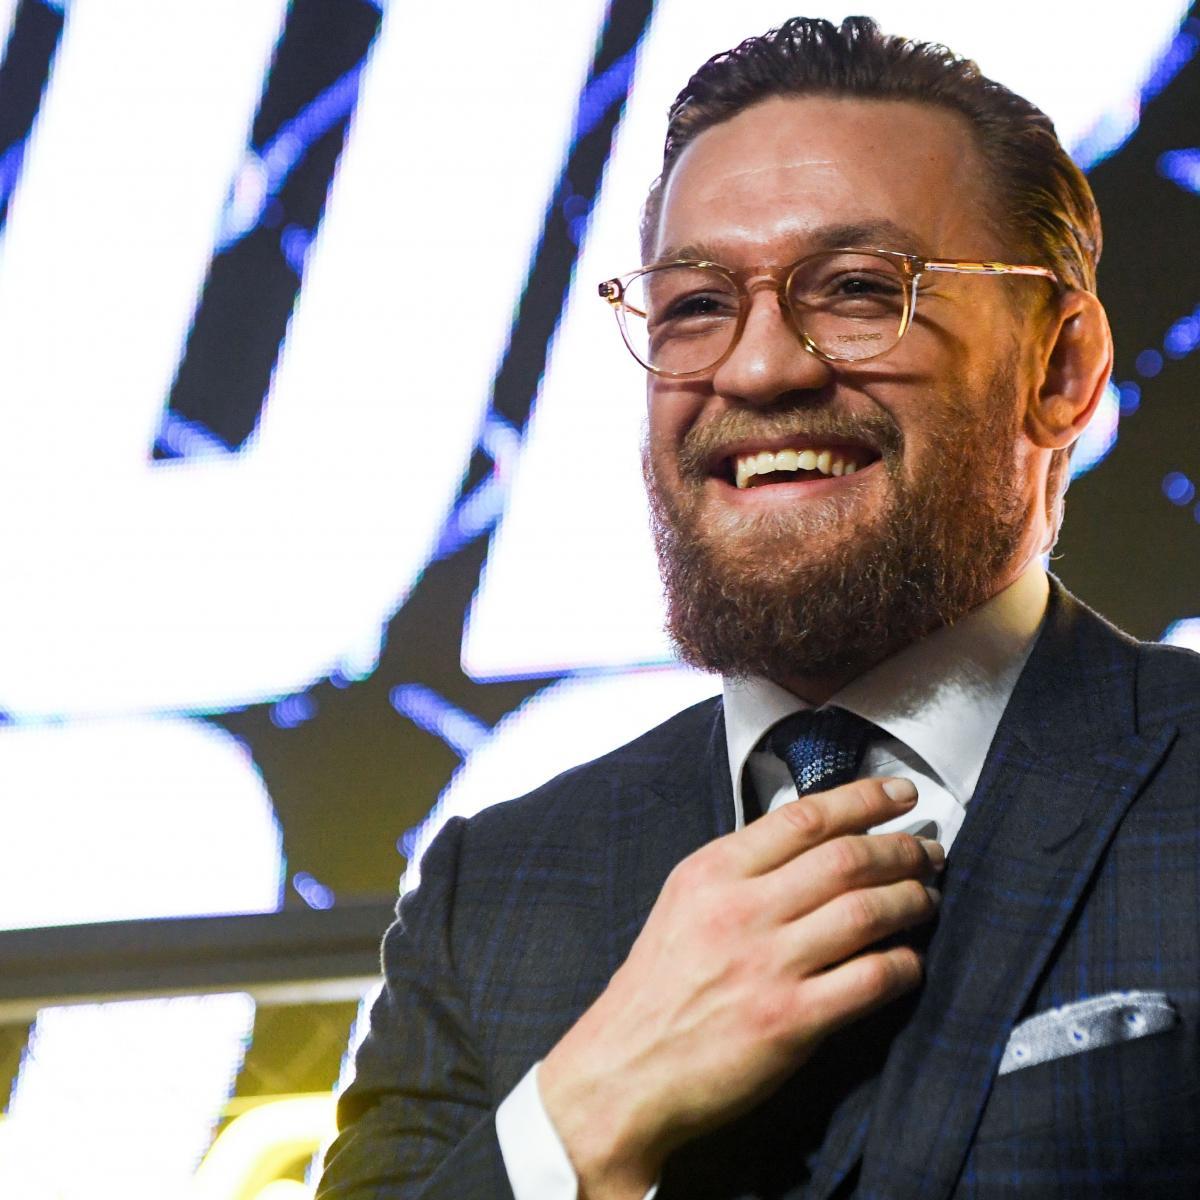 Ahead of UFC 246 Return, Conor McGregor Is Sending Mixed Signals